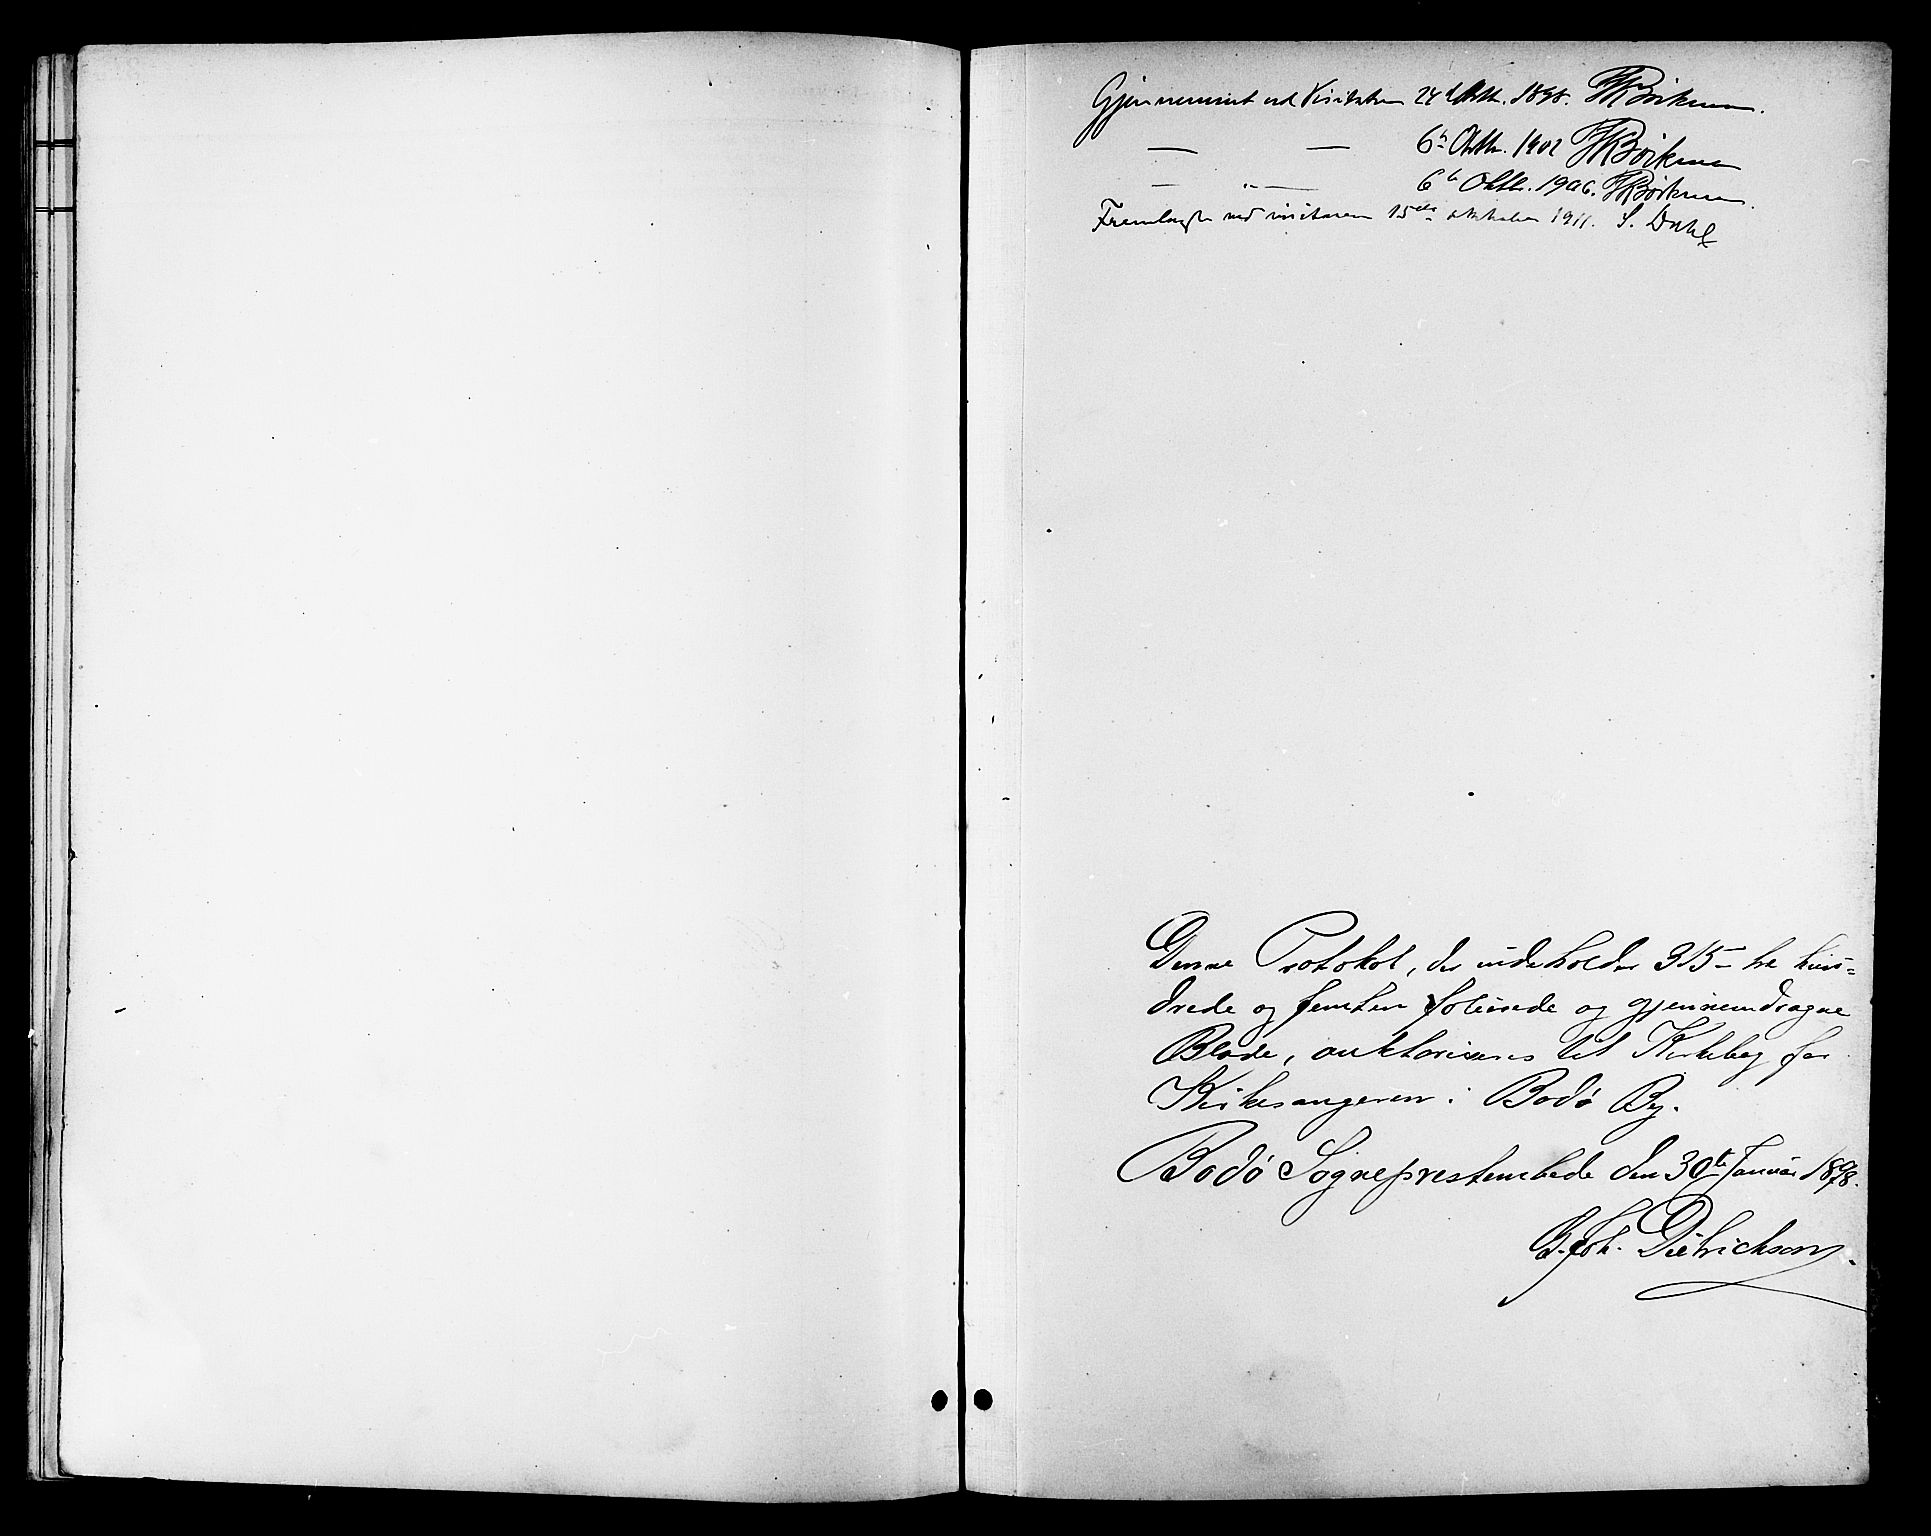 SAT, Ministerialprotokoller, klokkerbøker og fødselsregistre - Nordland, 801/L0033: Klokkerbok nr. 801C08, 1898-1910